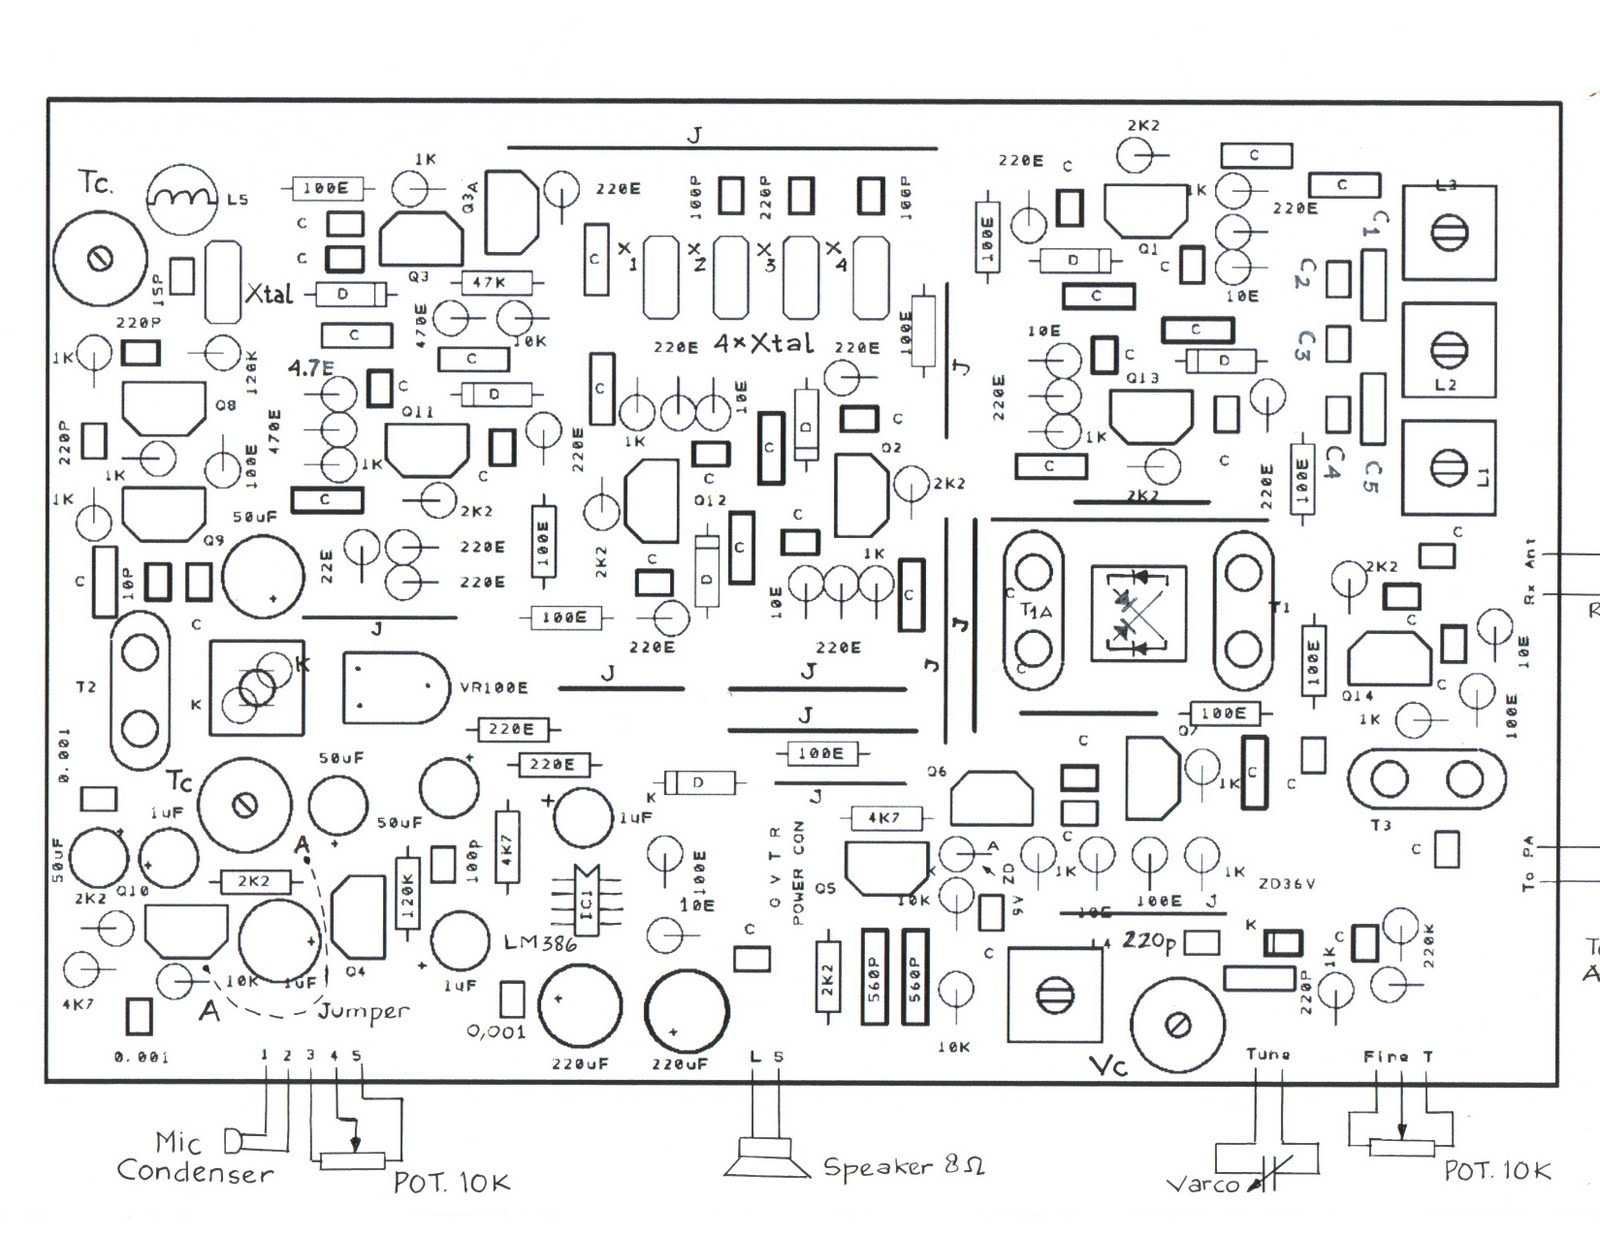 small resolution of kenwood ez500 wiring harness wiring diagram specialtieskenwood kdc 610u wiring harnes wiring diagram databasea wiring harness